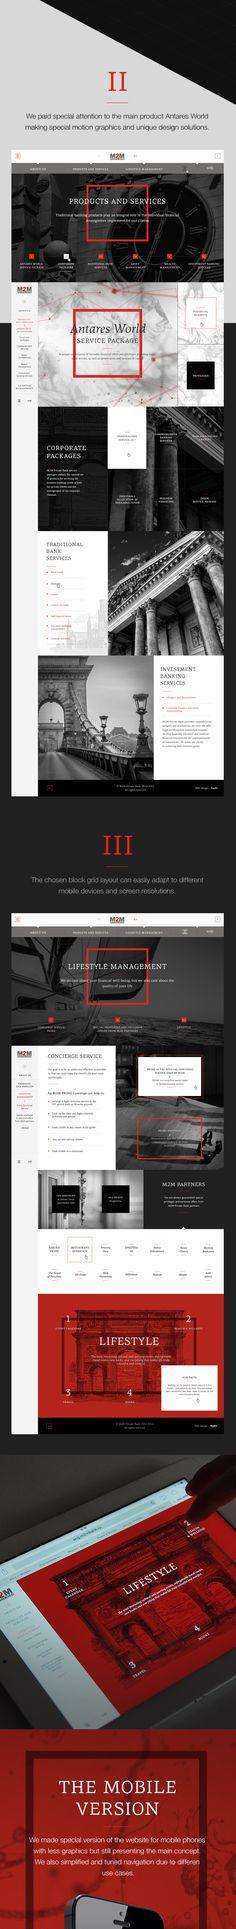 M2M Private Bank by Pavel Dergachev, via Behance